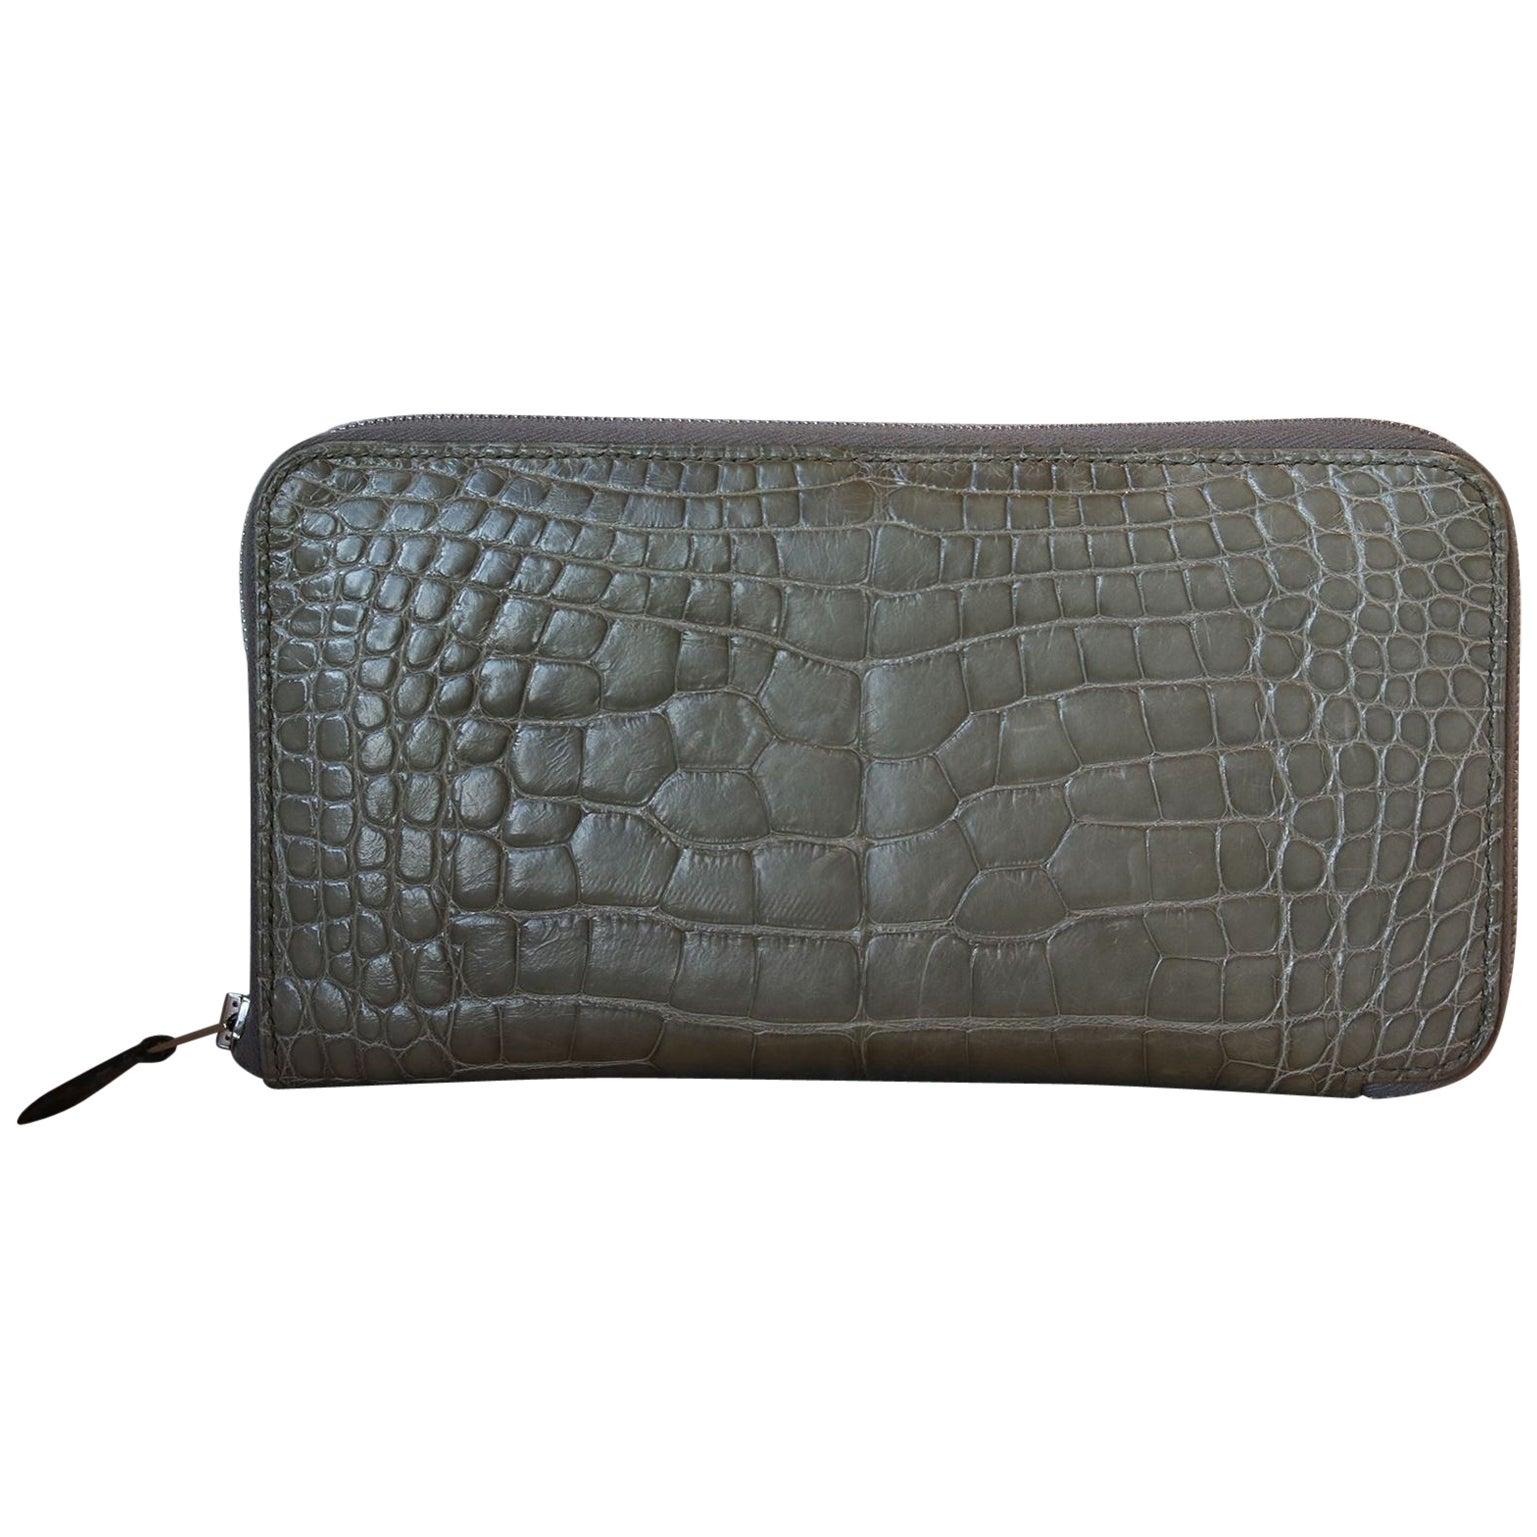 Hermès Azap Crocodile Leather Long Wallet